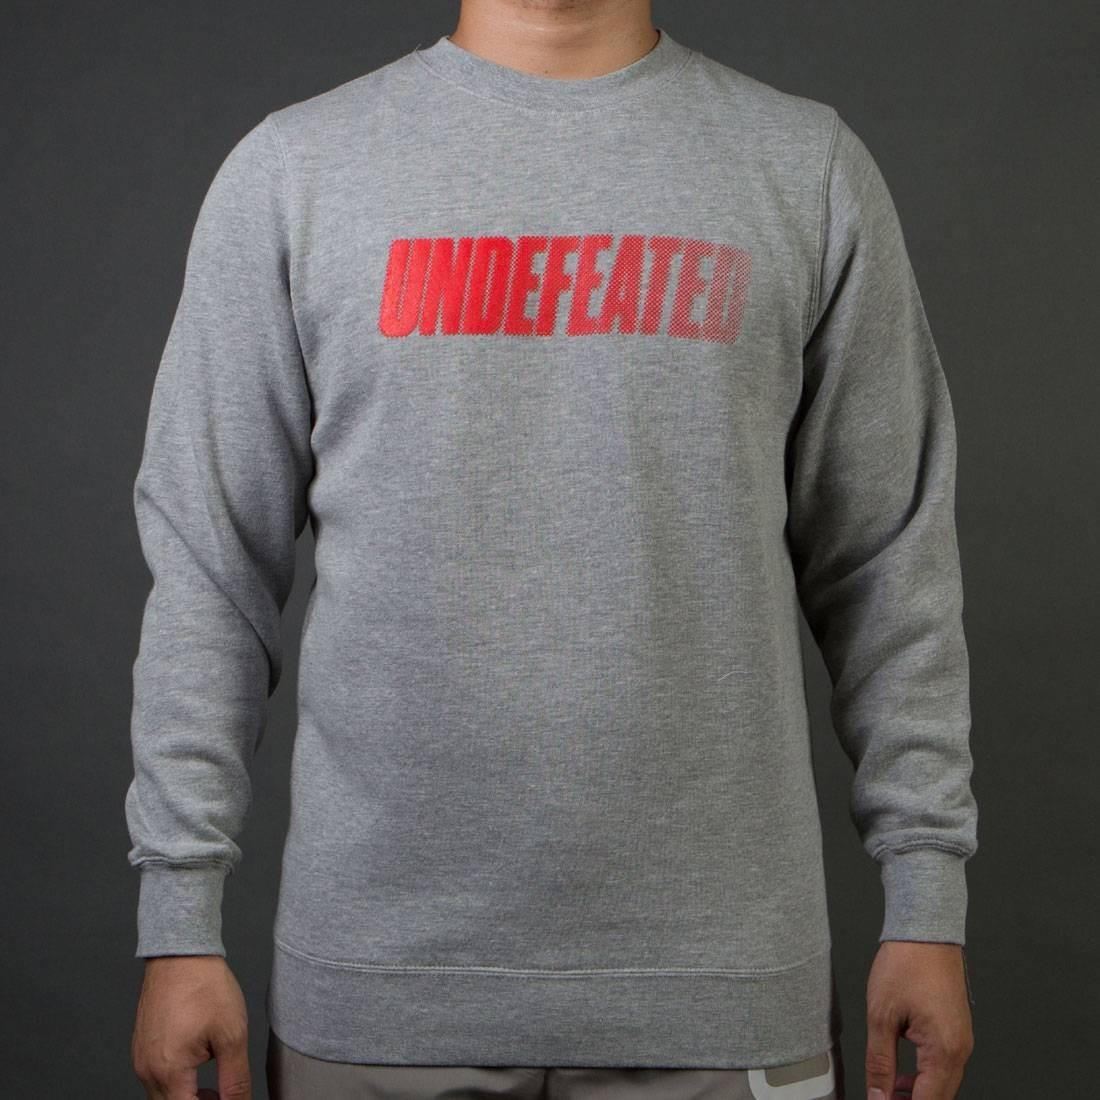 UNDEFEATED スピード メンズファッション トップス Tシャツ カットソー メンズ 【 Men Speed Tone Crew Sweater (gray / Heather) 】 Gray / Heather